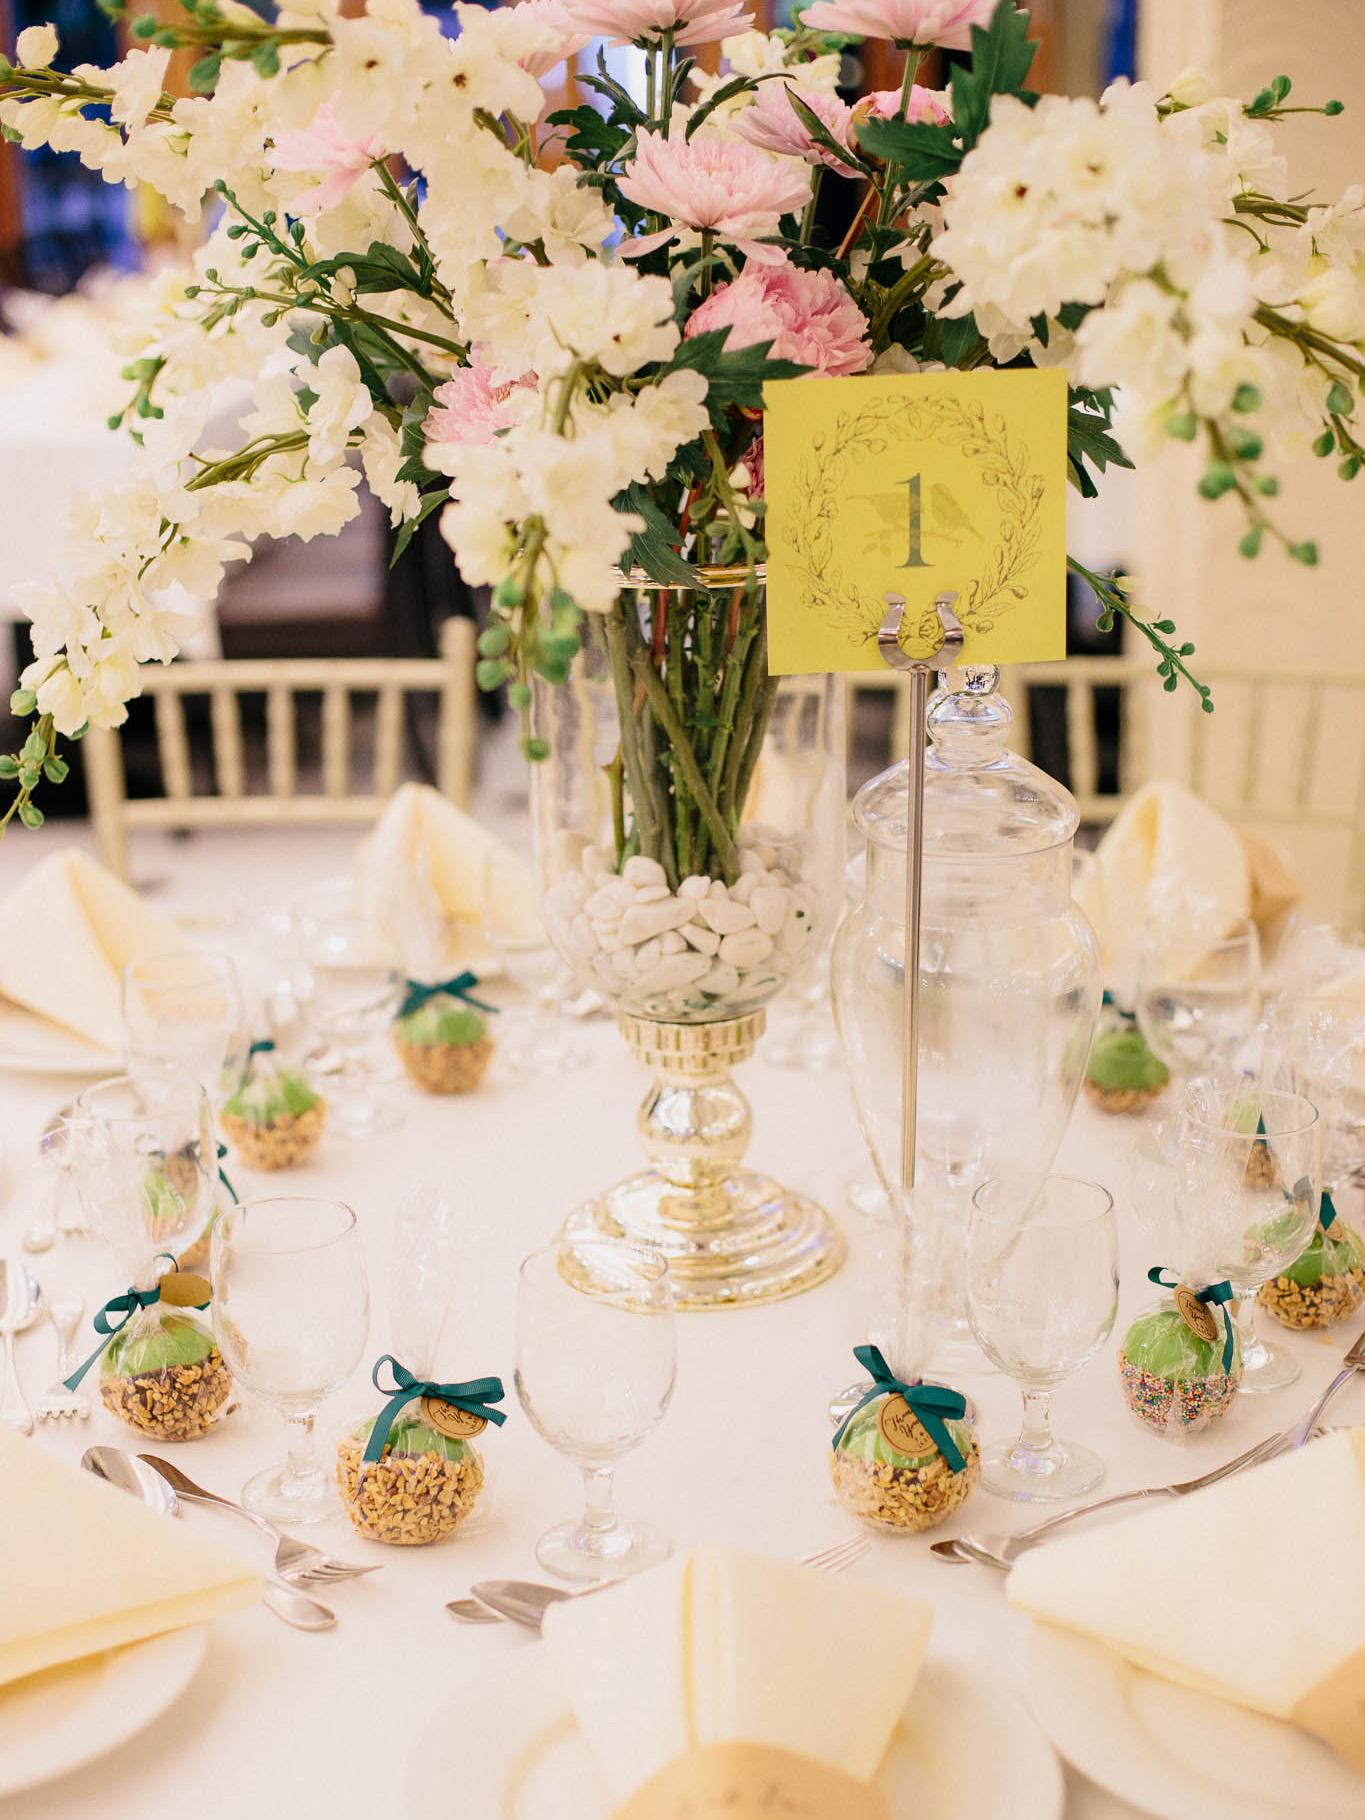 singapore-wedding-photographer-malay-indian-pre-wedding-travel-wmt-2015-25.jpg